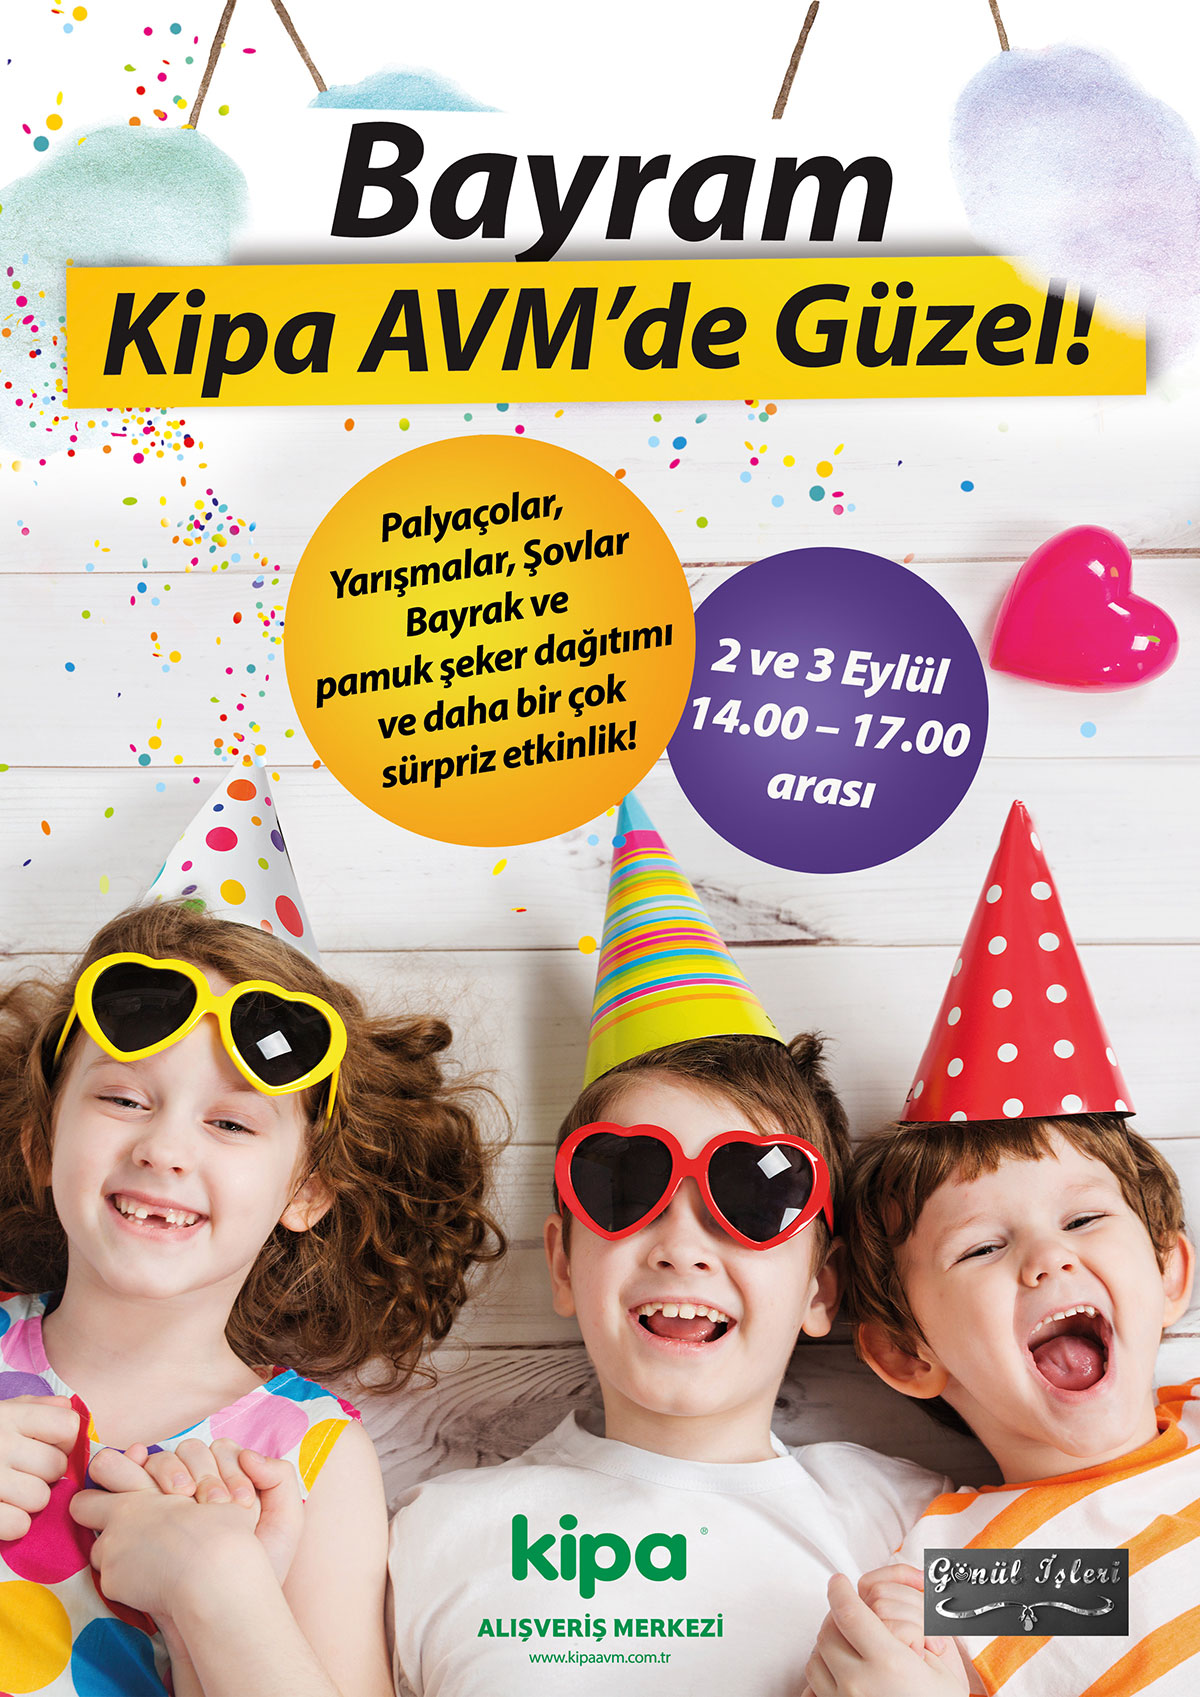 Bayram Kipa AVM'de Güzel!